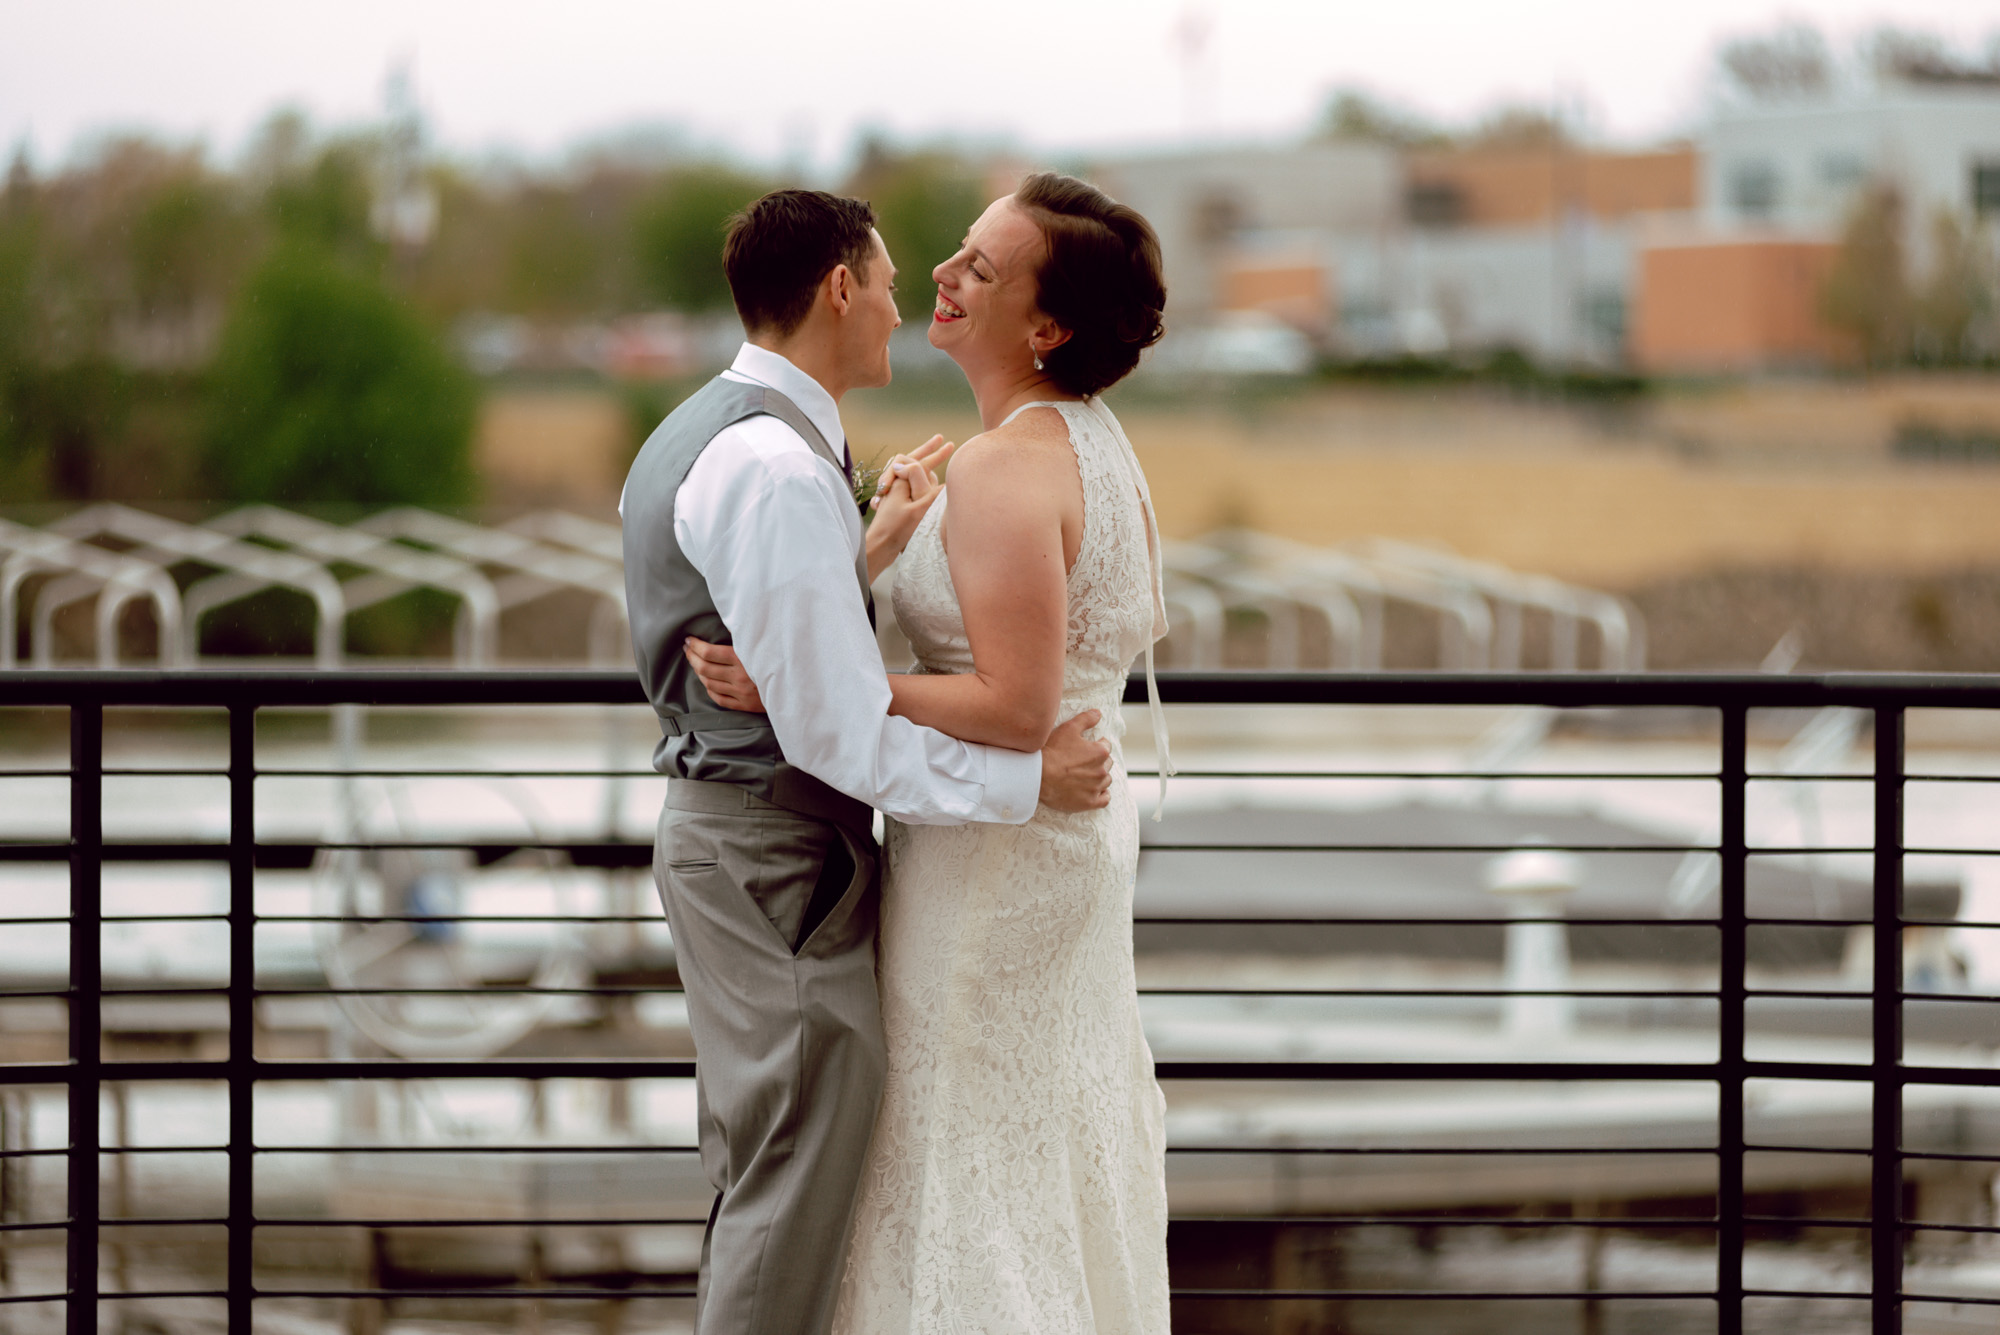 prairie-street-brewhouse-wedding-Rockford-IL-wedding-photographers-73.jpg